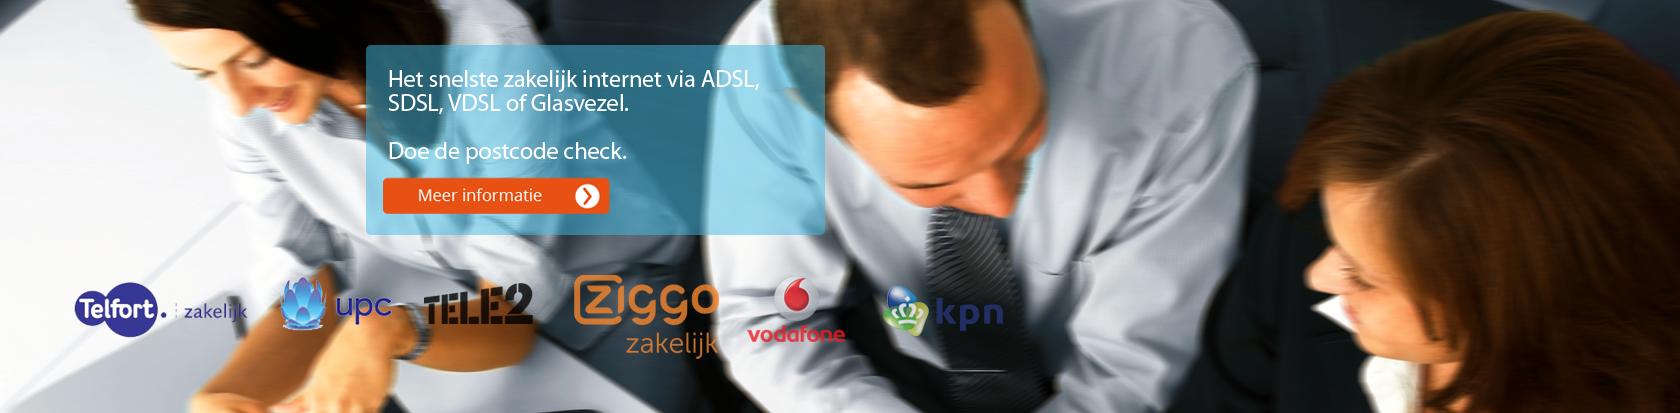 Het snelste zakelijk internet via ADSL, SDSL, VDSL of Glasvezel. Doe de postcode check.